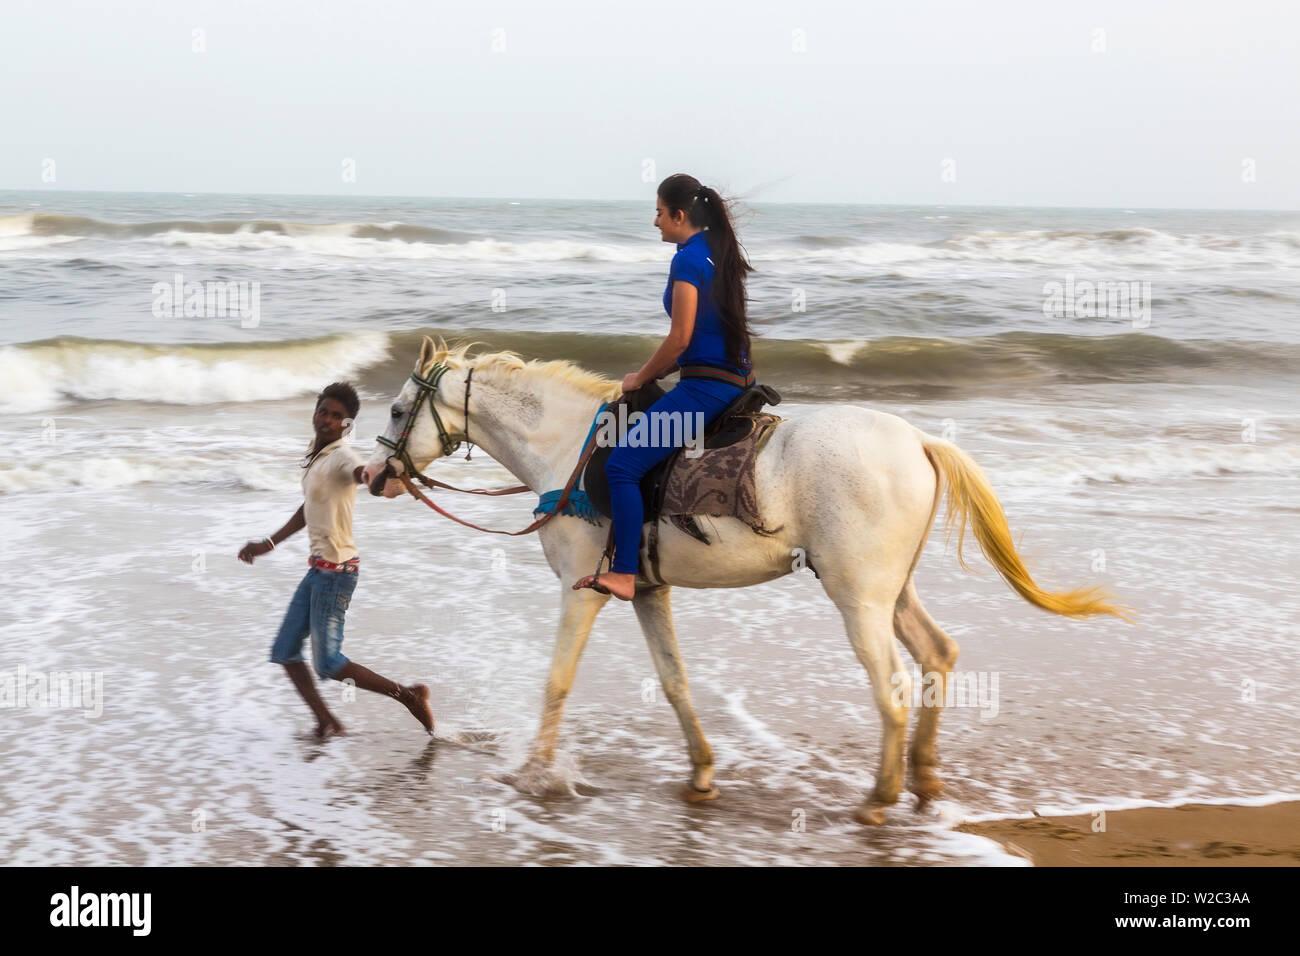 Horse Riding On The Beach Chennai Madras Tamil Nadu India Stock Photo Alamy